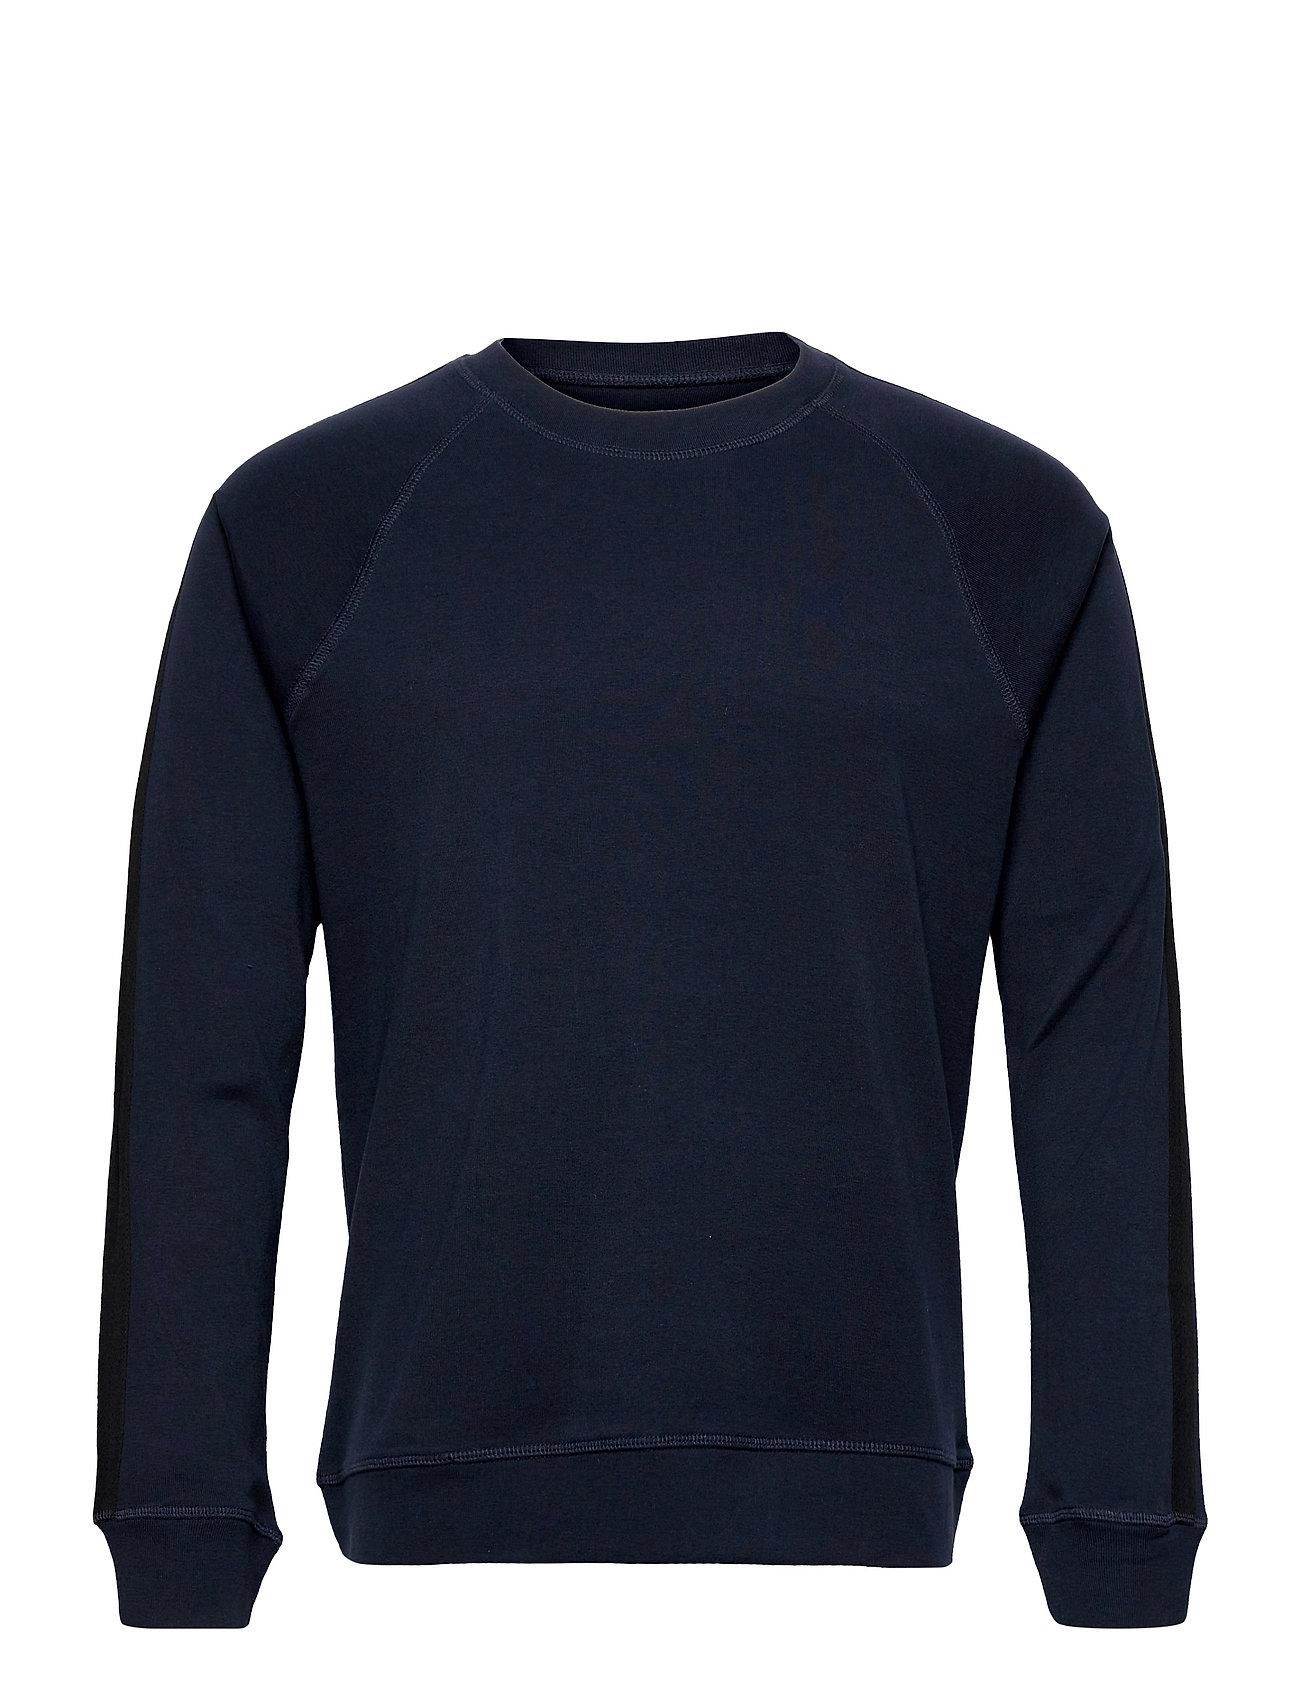 Cotton Rib Stelt Tape Sweatshirt Trøje Blå Mads Nørgaard